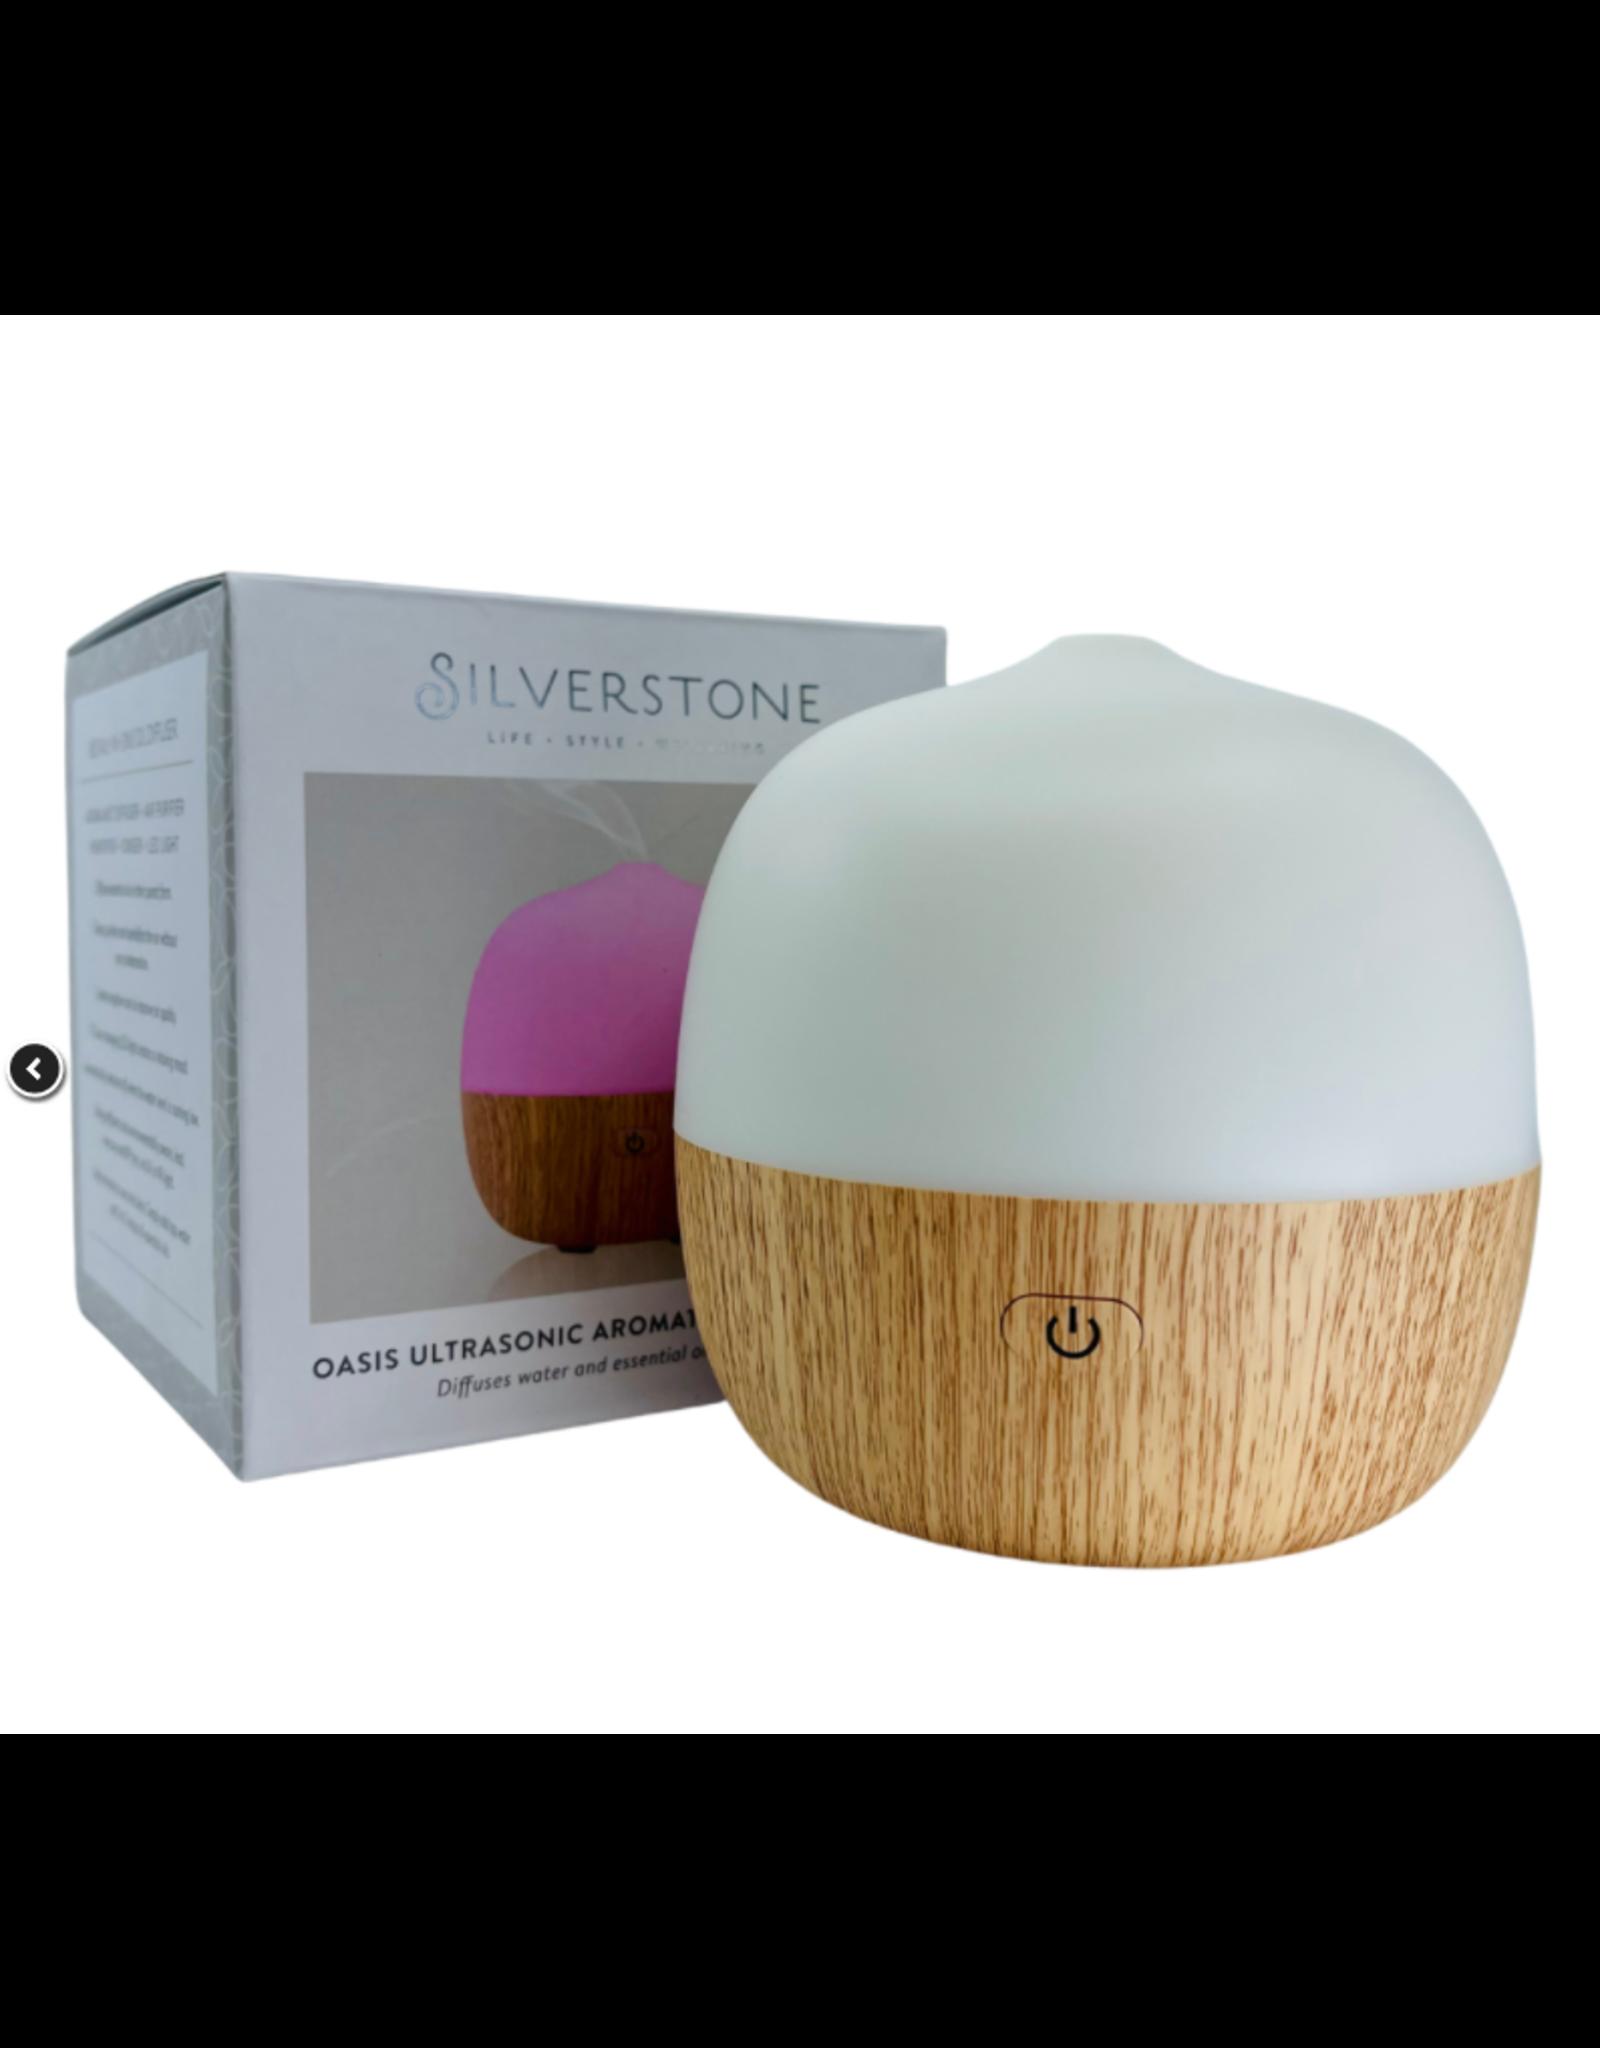 Silverstone Ultrasonic Aromatherapy Diffuser Oasis